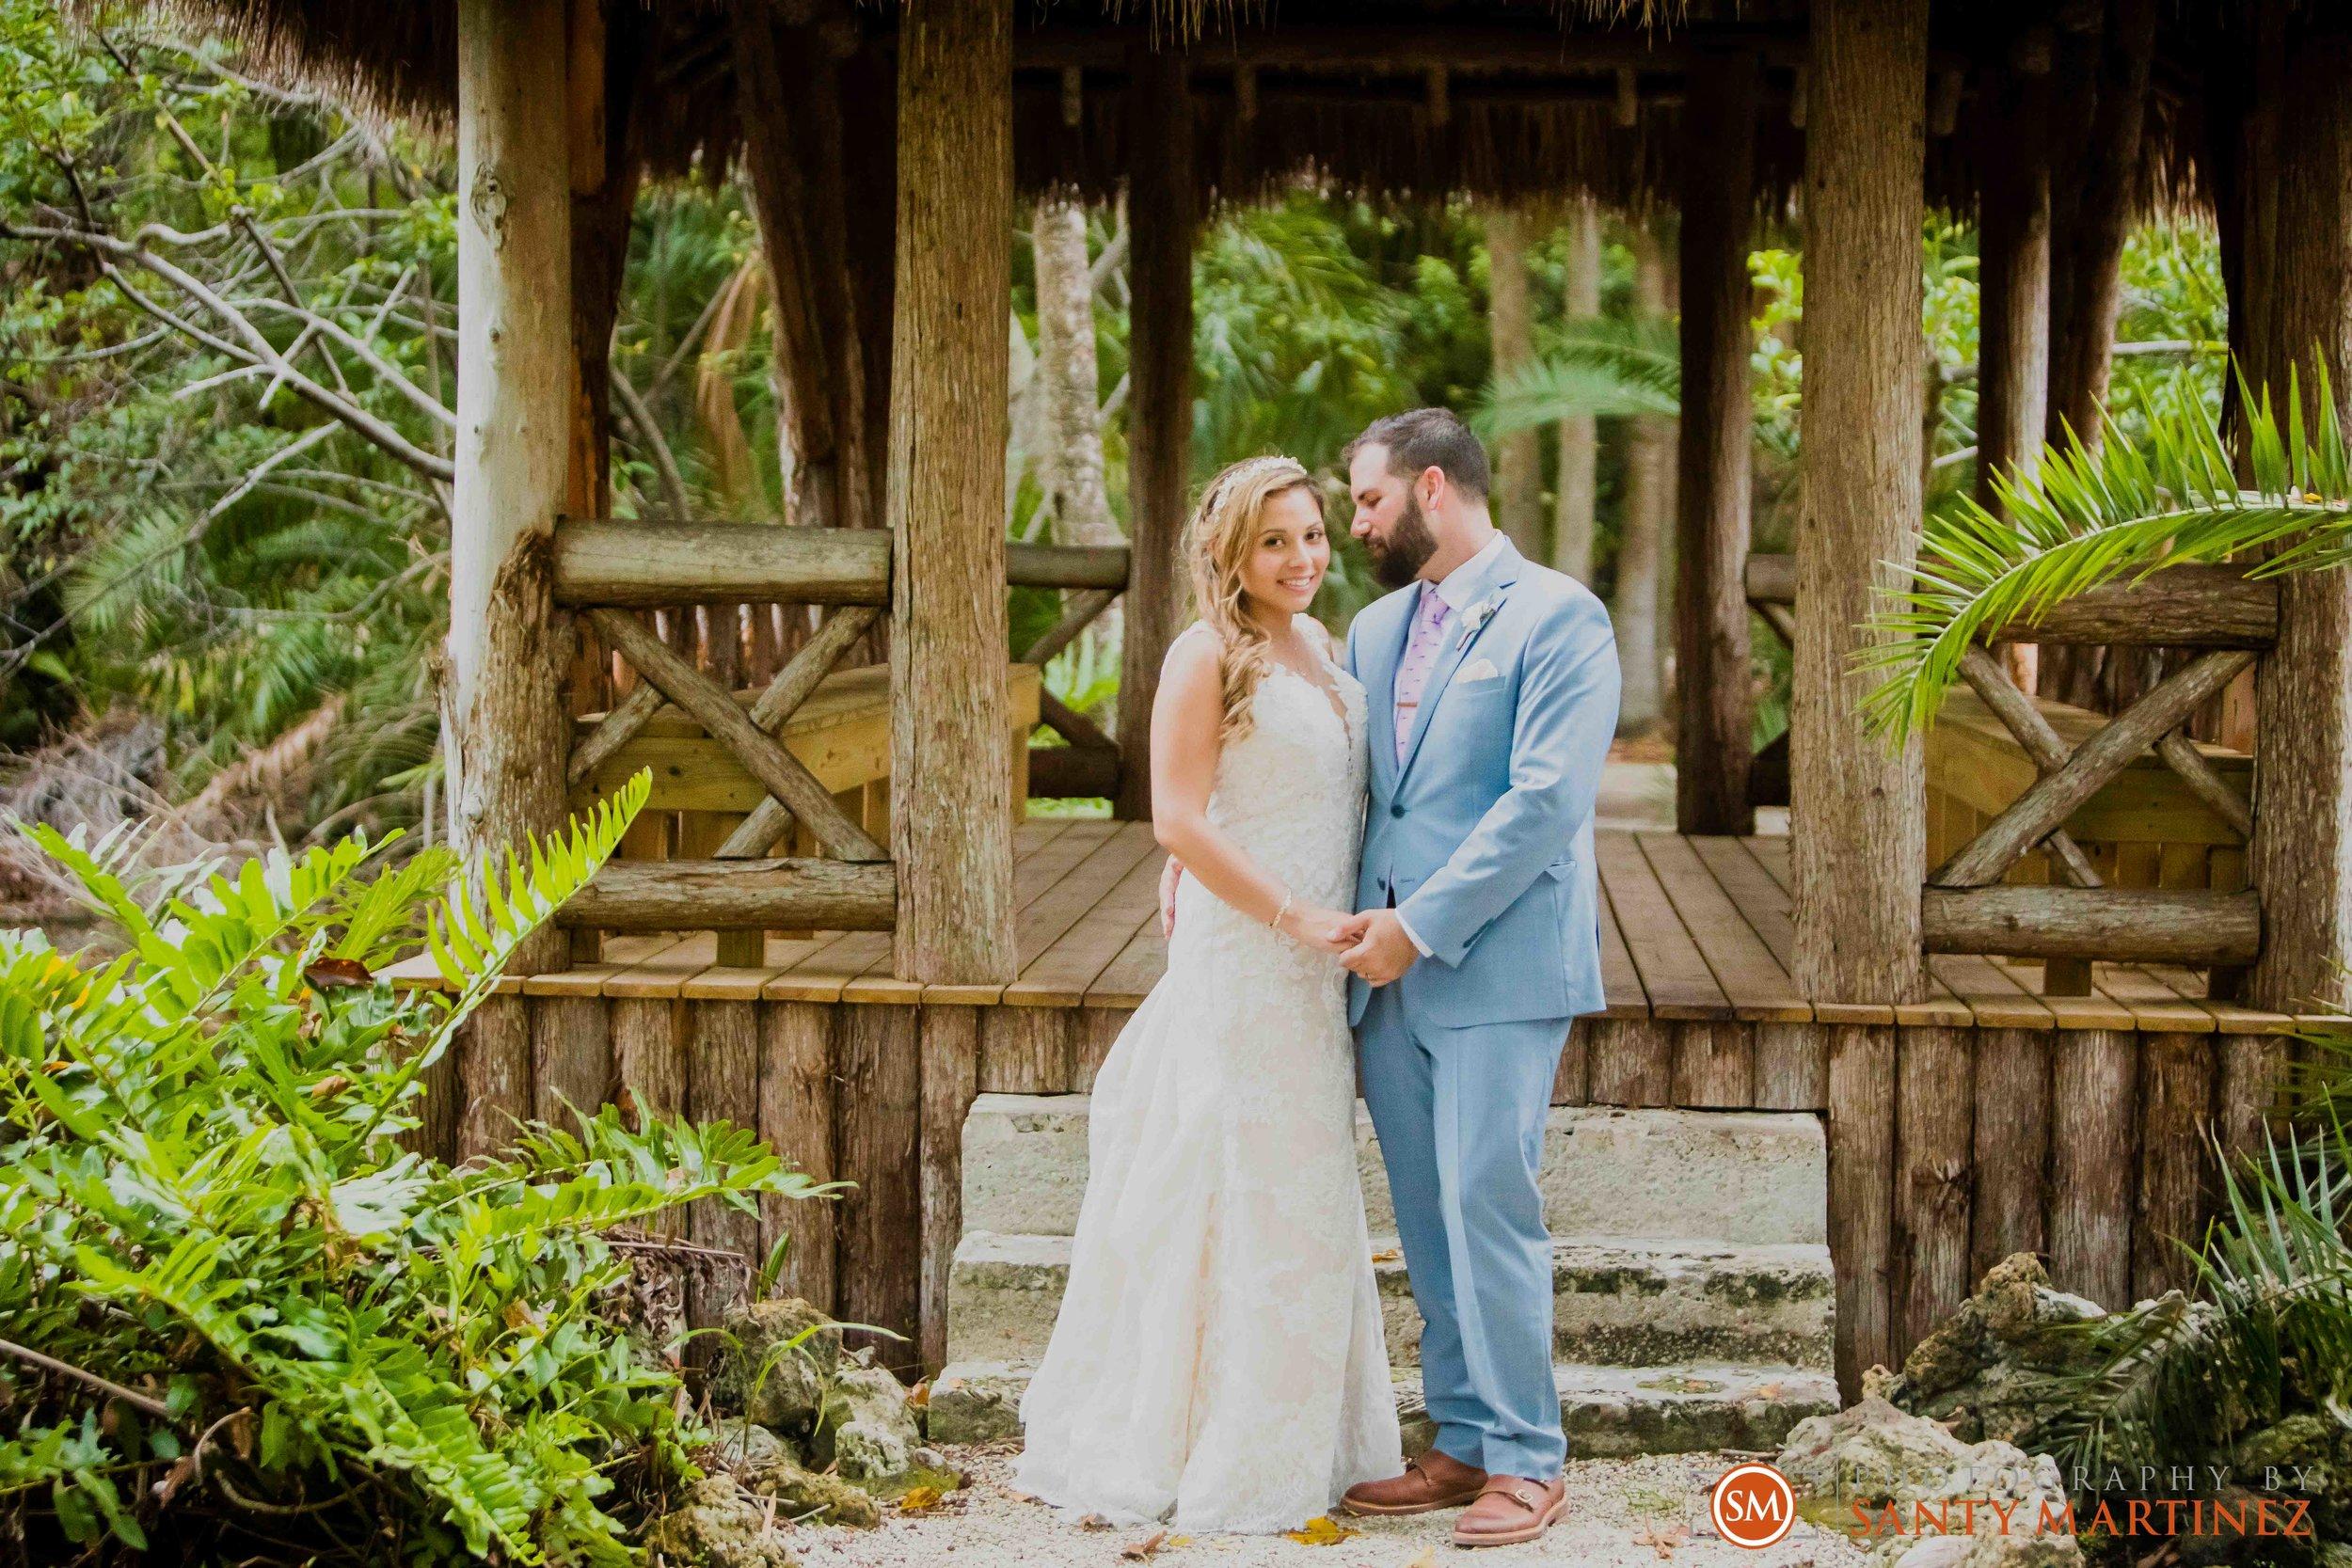 Wedding Bonnet House - Santy Martinez Photography-58.jpg